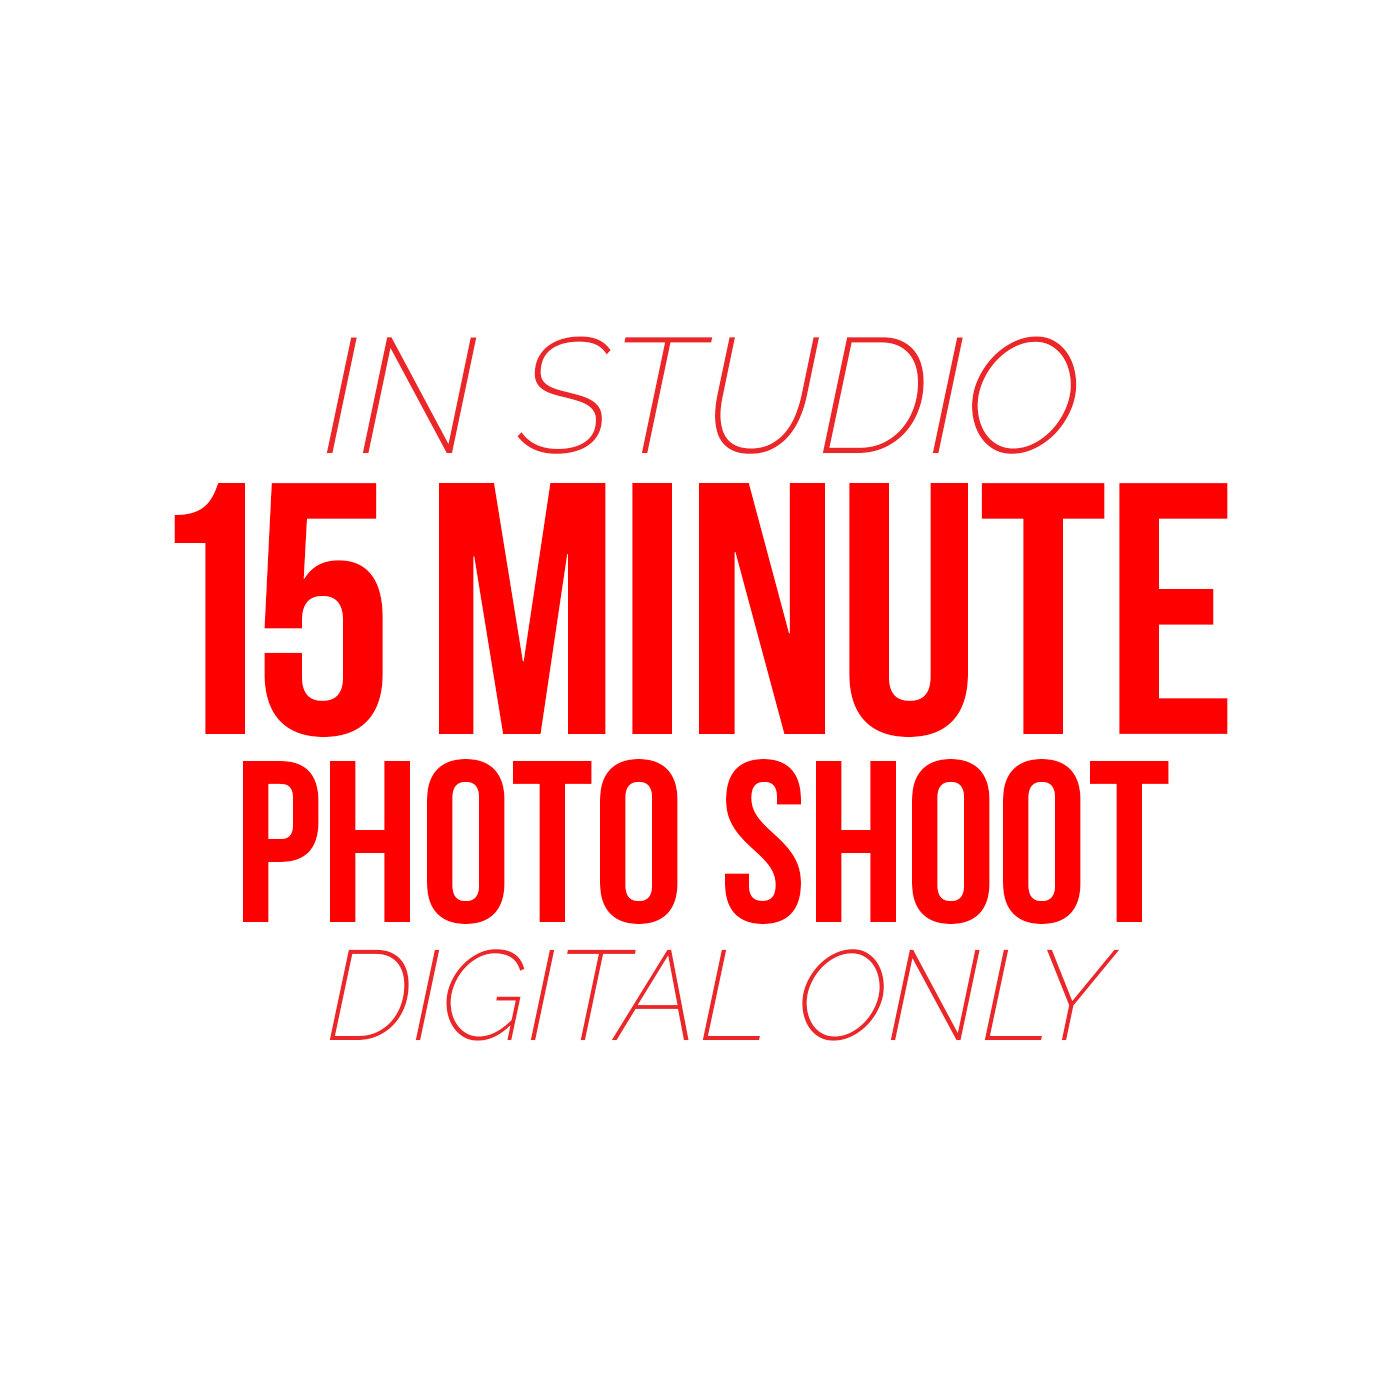 15 Minute Photo Shoot